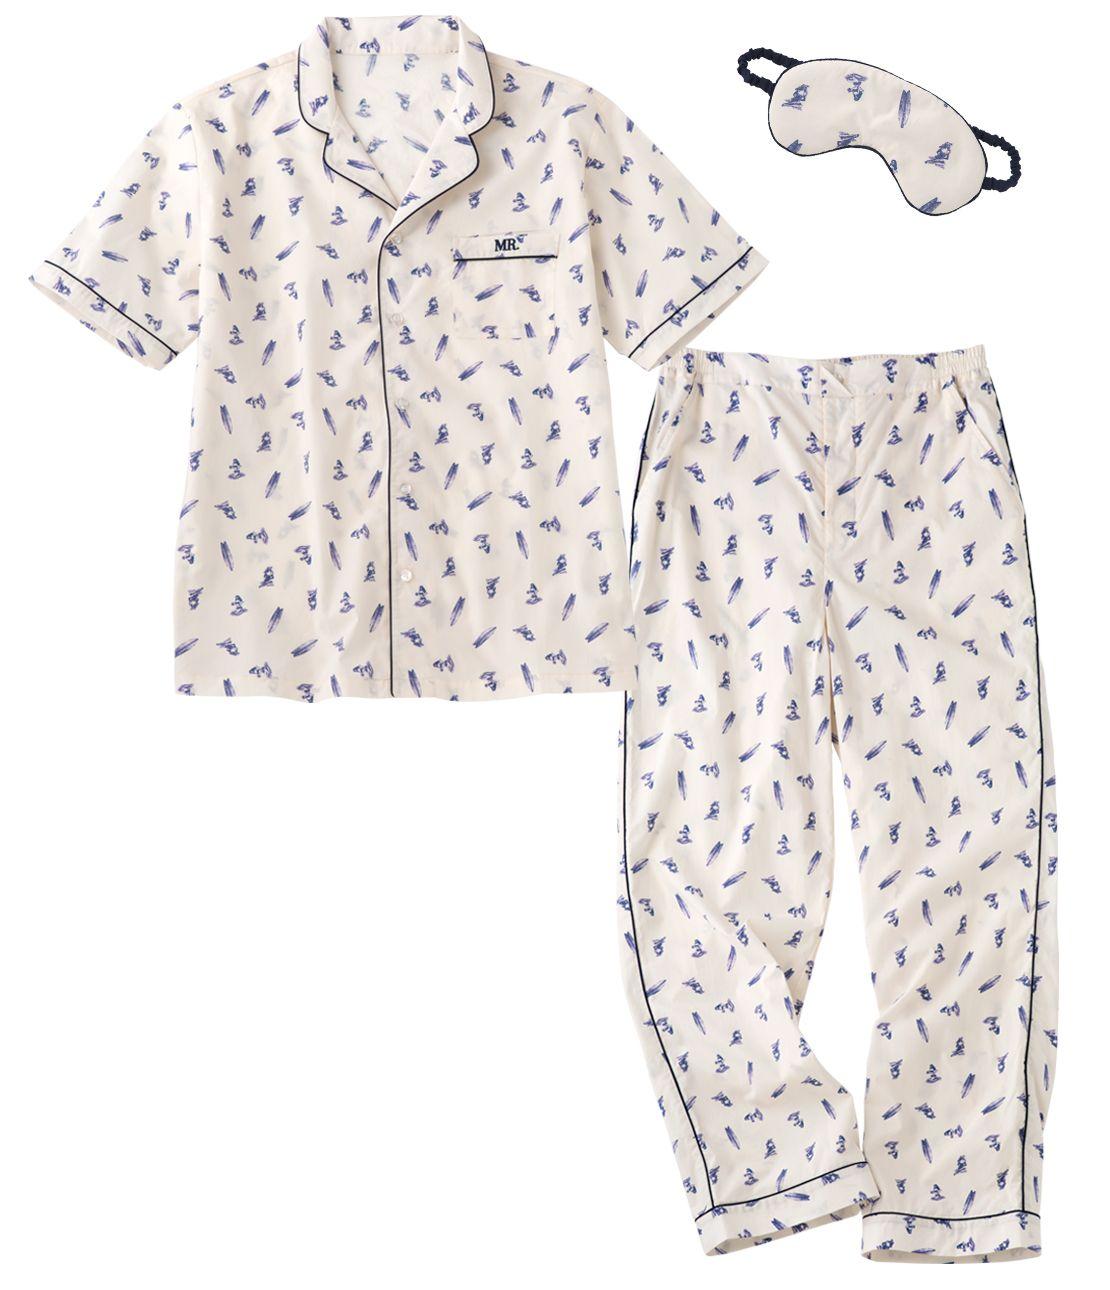 Men's cotton shirts pajamas set